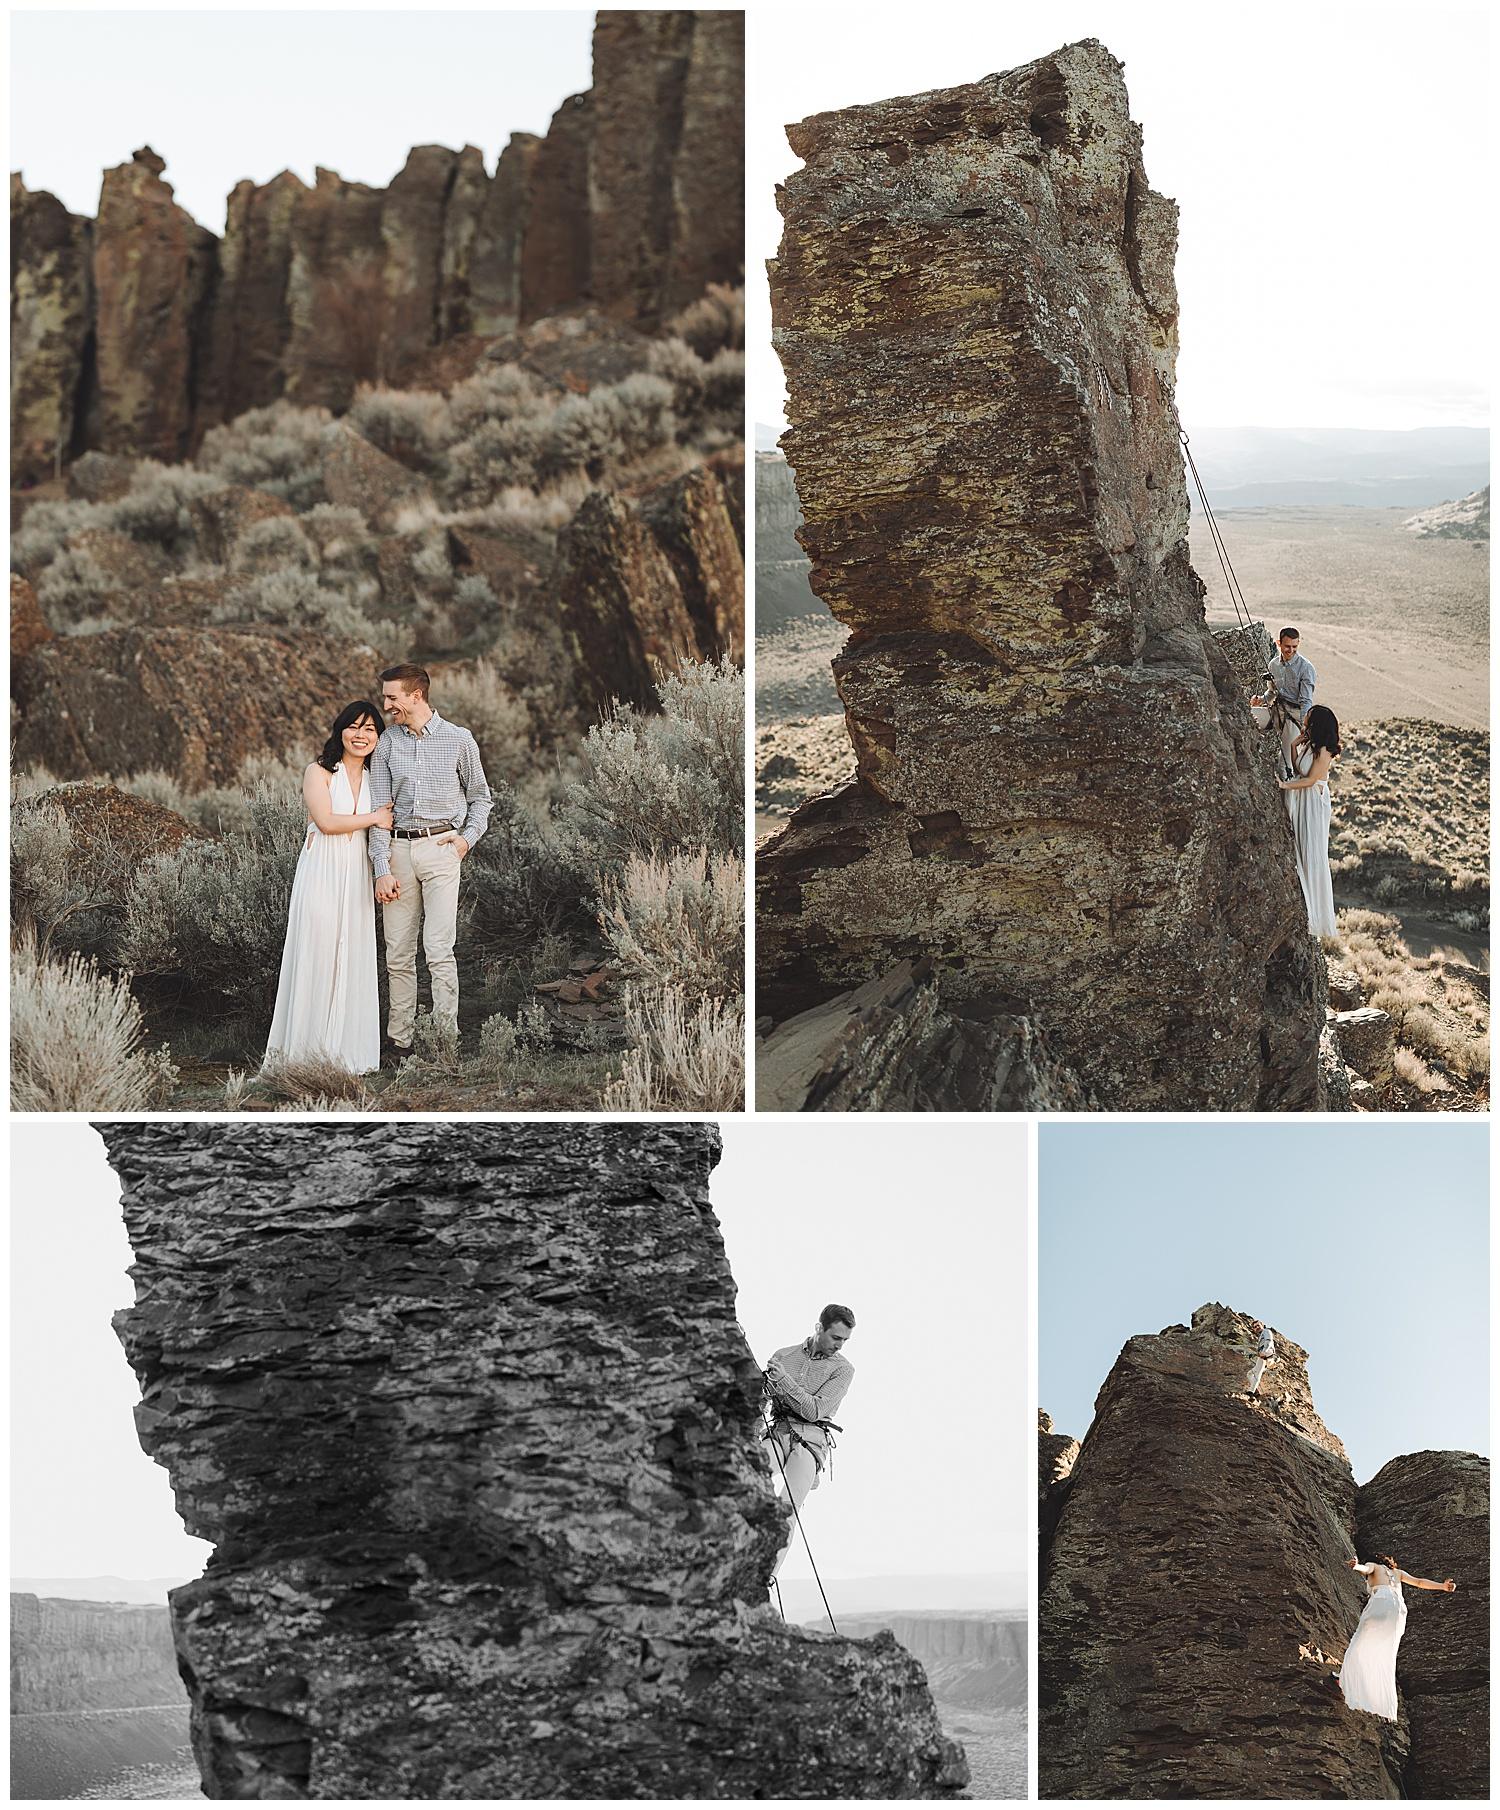 Rock-climbing-engagement-photo-shoot_Stephanie-Keegan-Photography_08.jpg